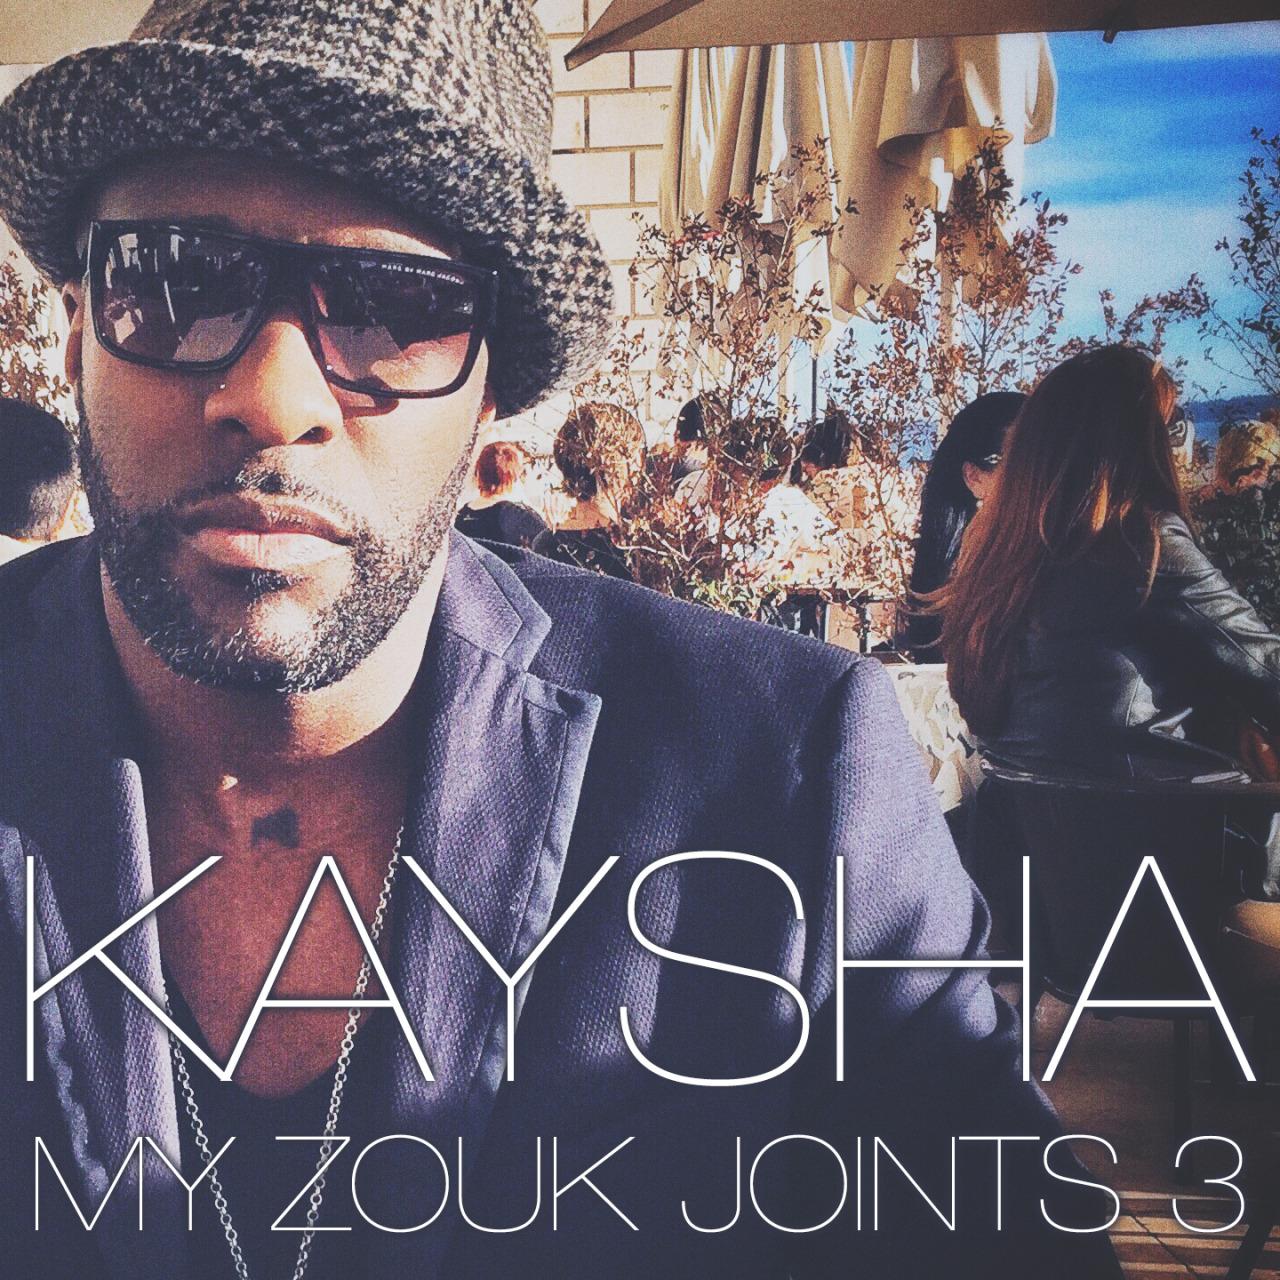 Kaysha Zoukstation.com